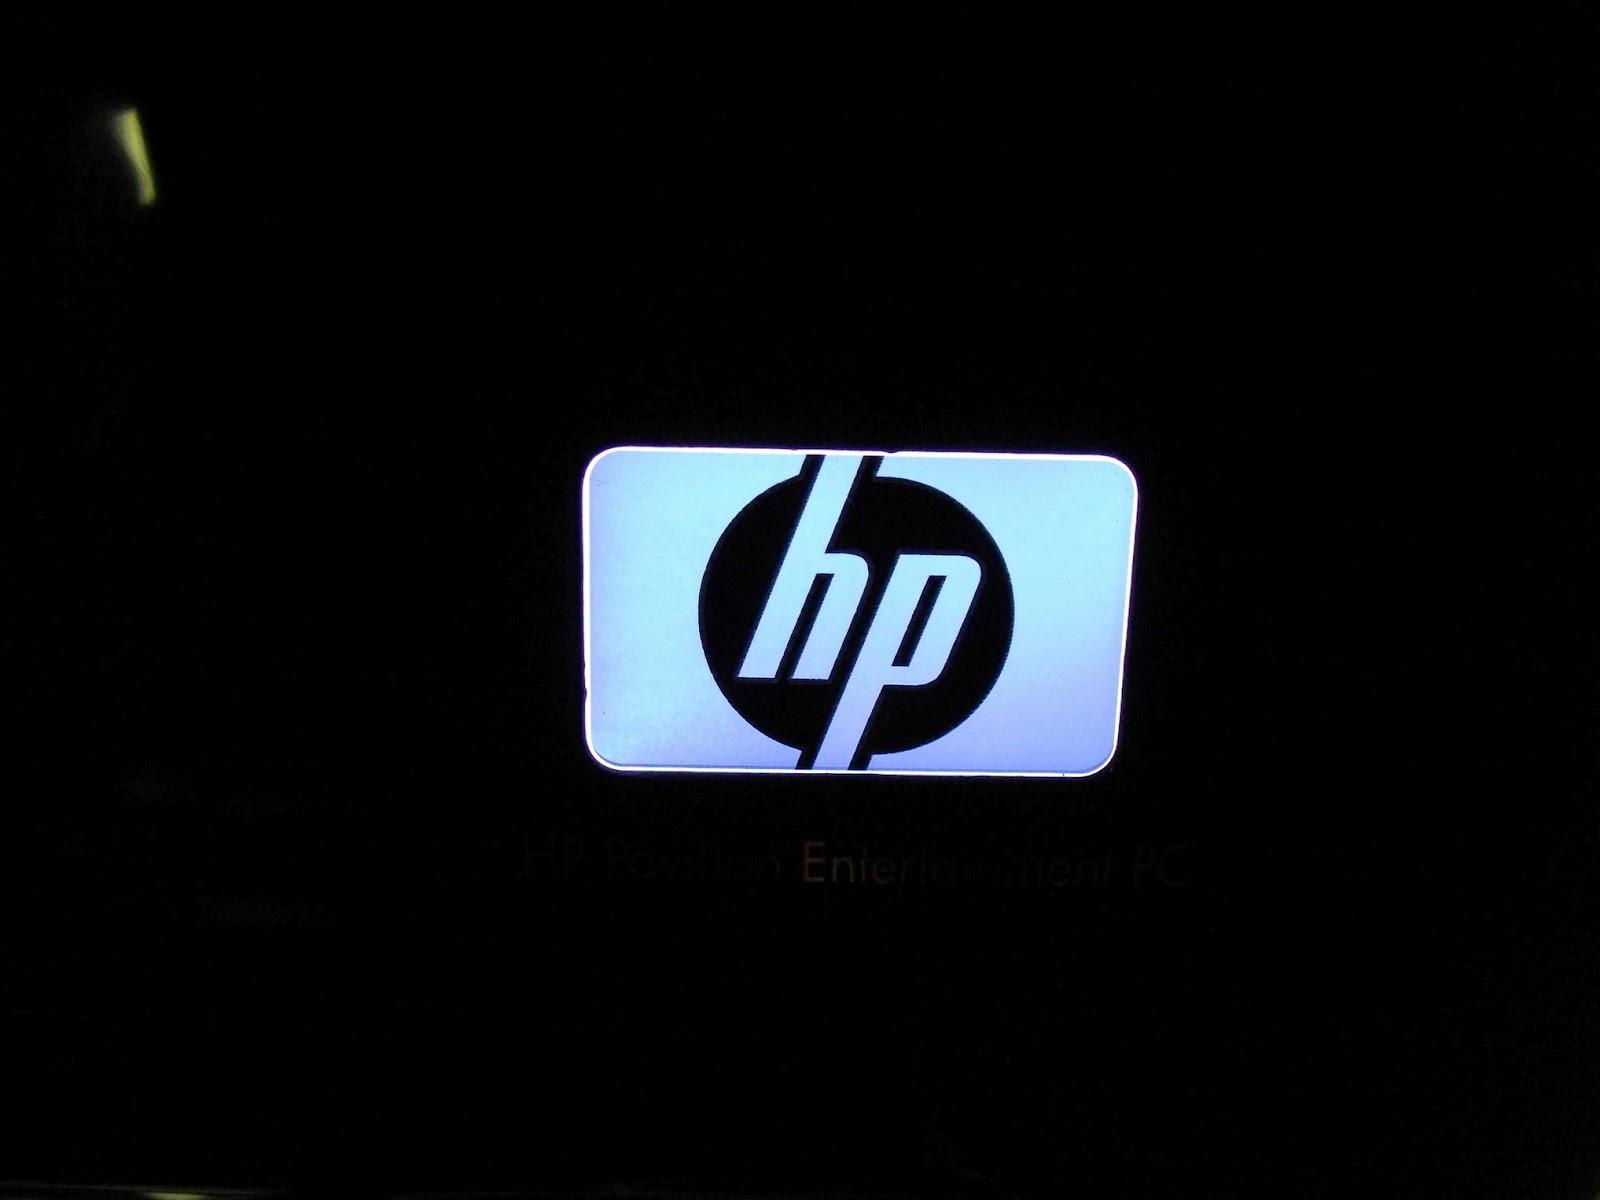 hp HD logo wallpaperhp HD logo Popular Pictures 1600x1200